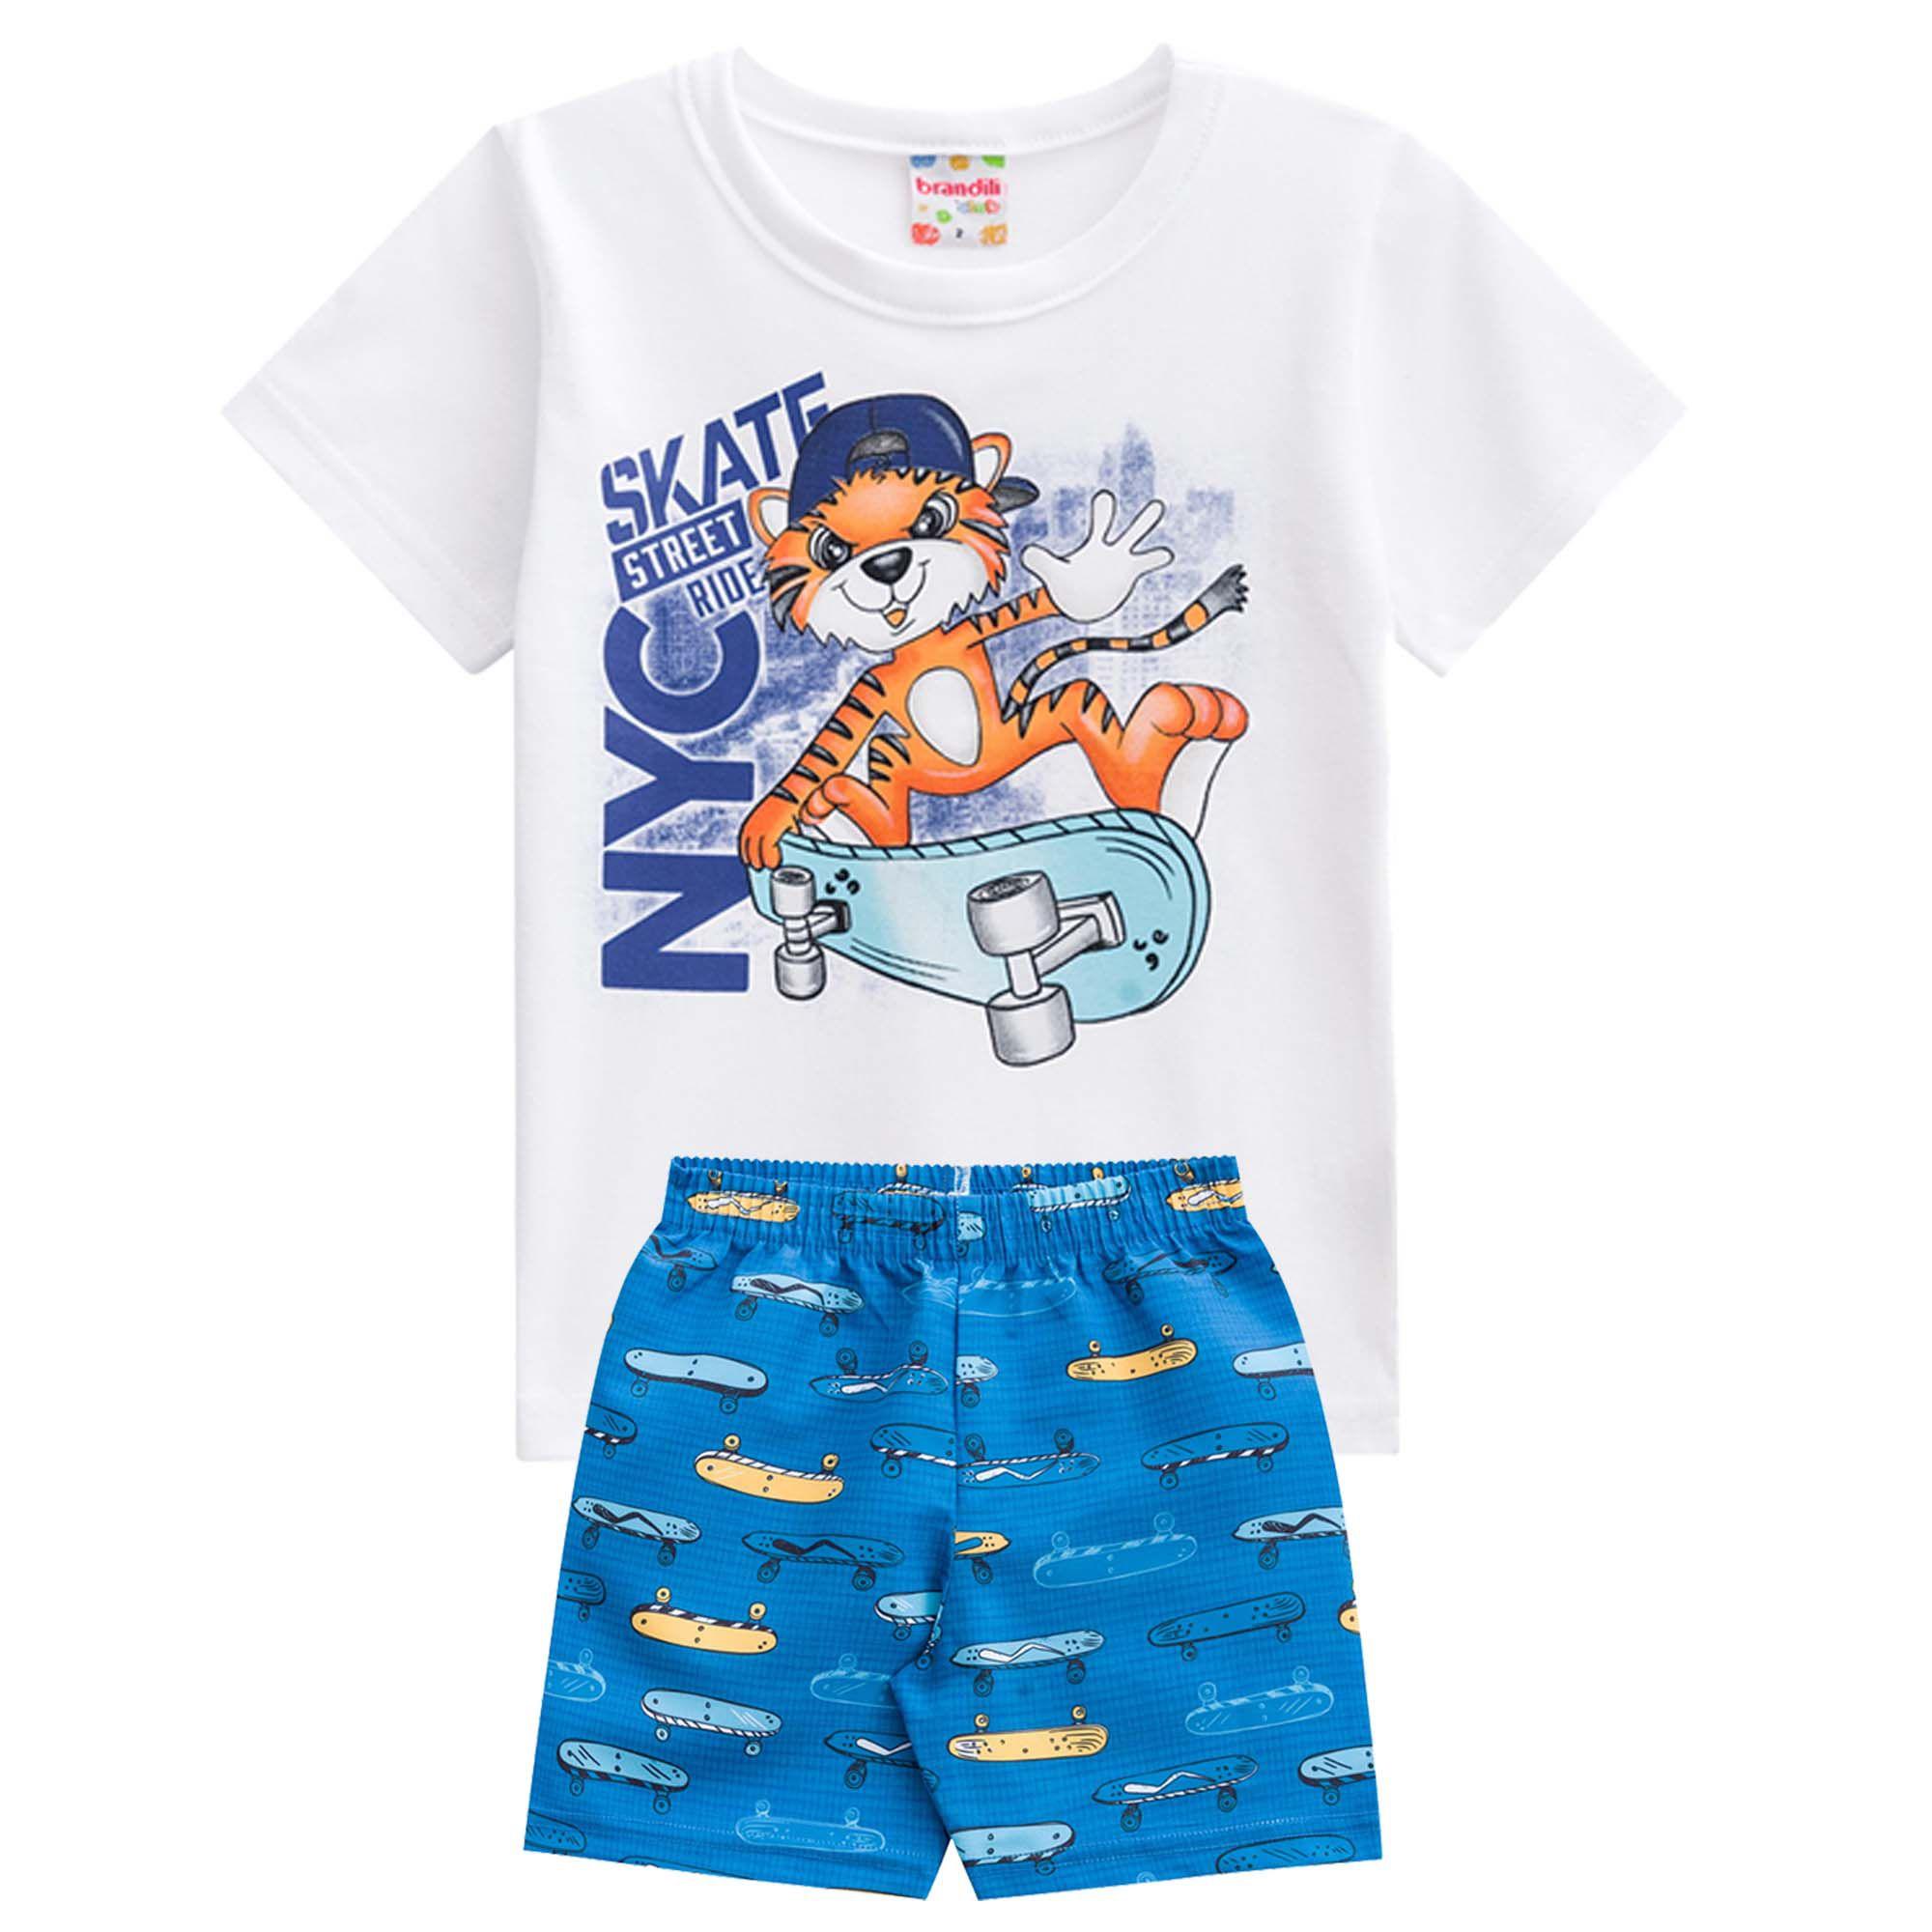 Conjunto Verão Brandili Club Camiseta Skate Street Ride NYC com Bermuda - 1 ao 3